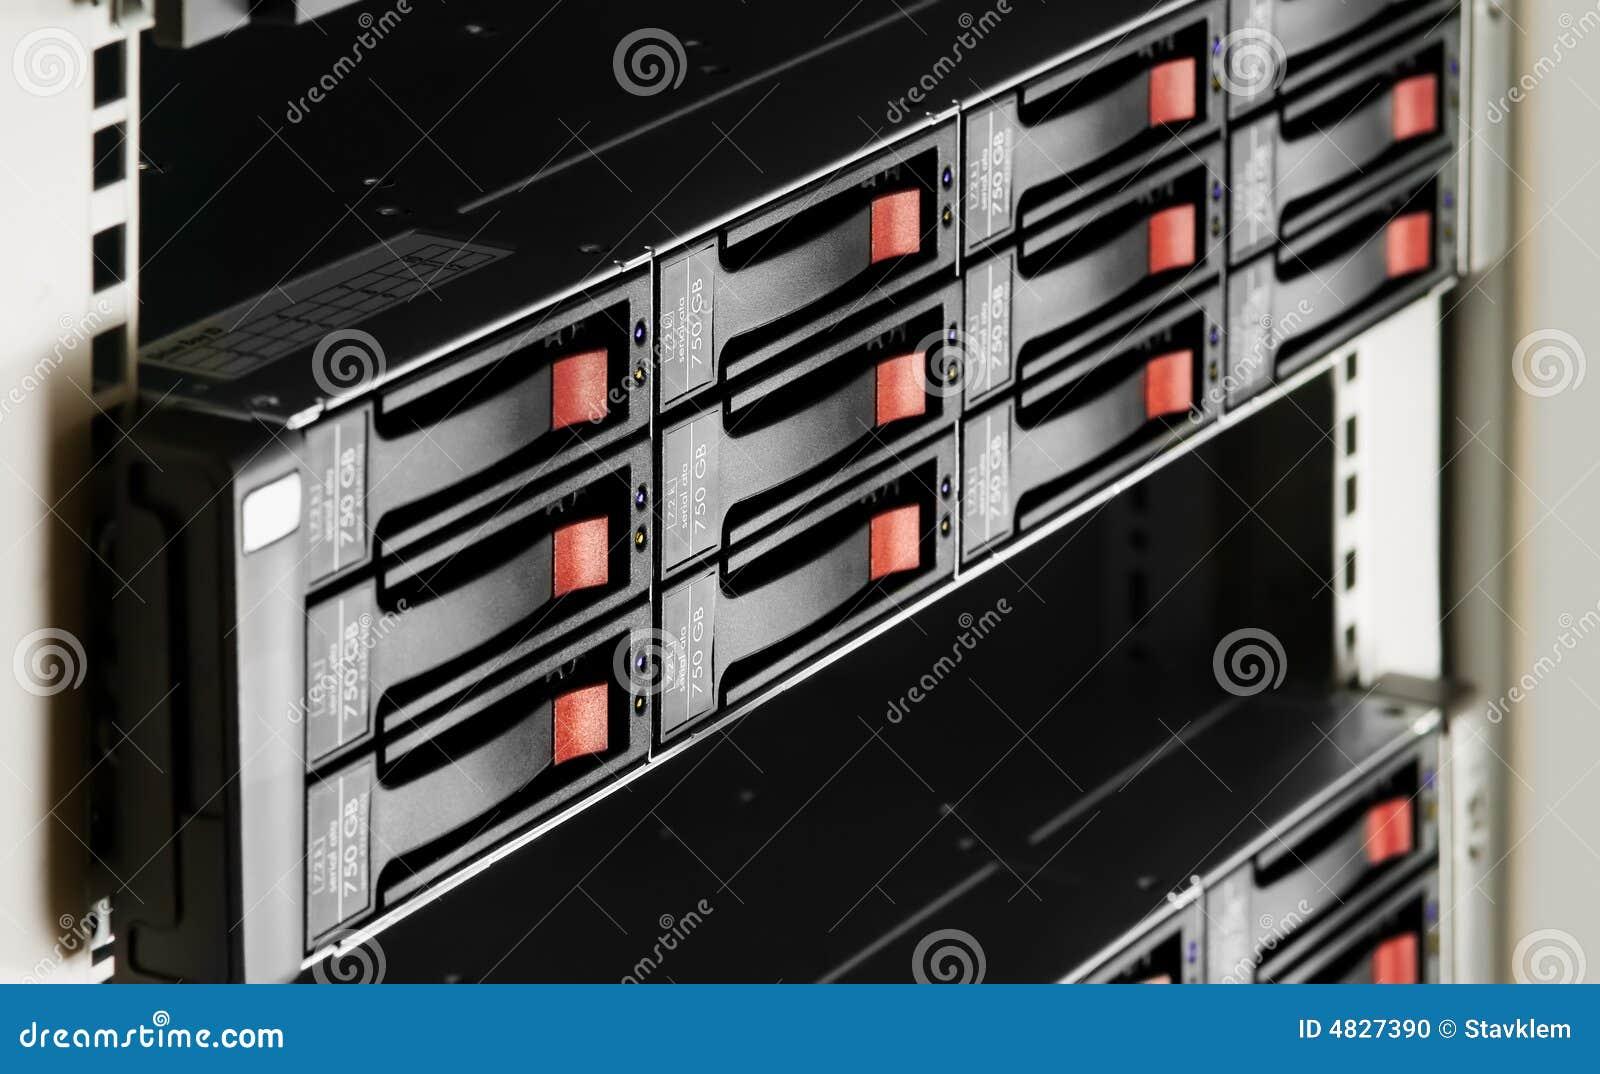 Rack-mounted Plattereihe